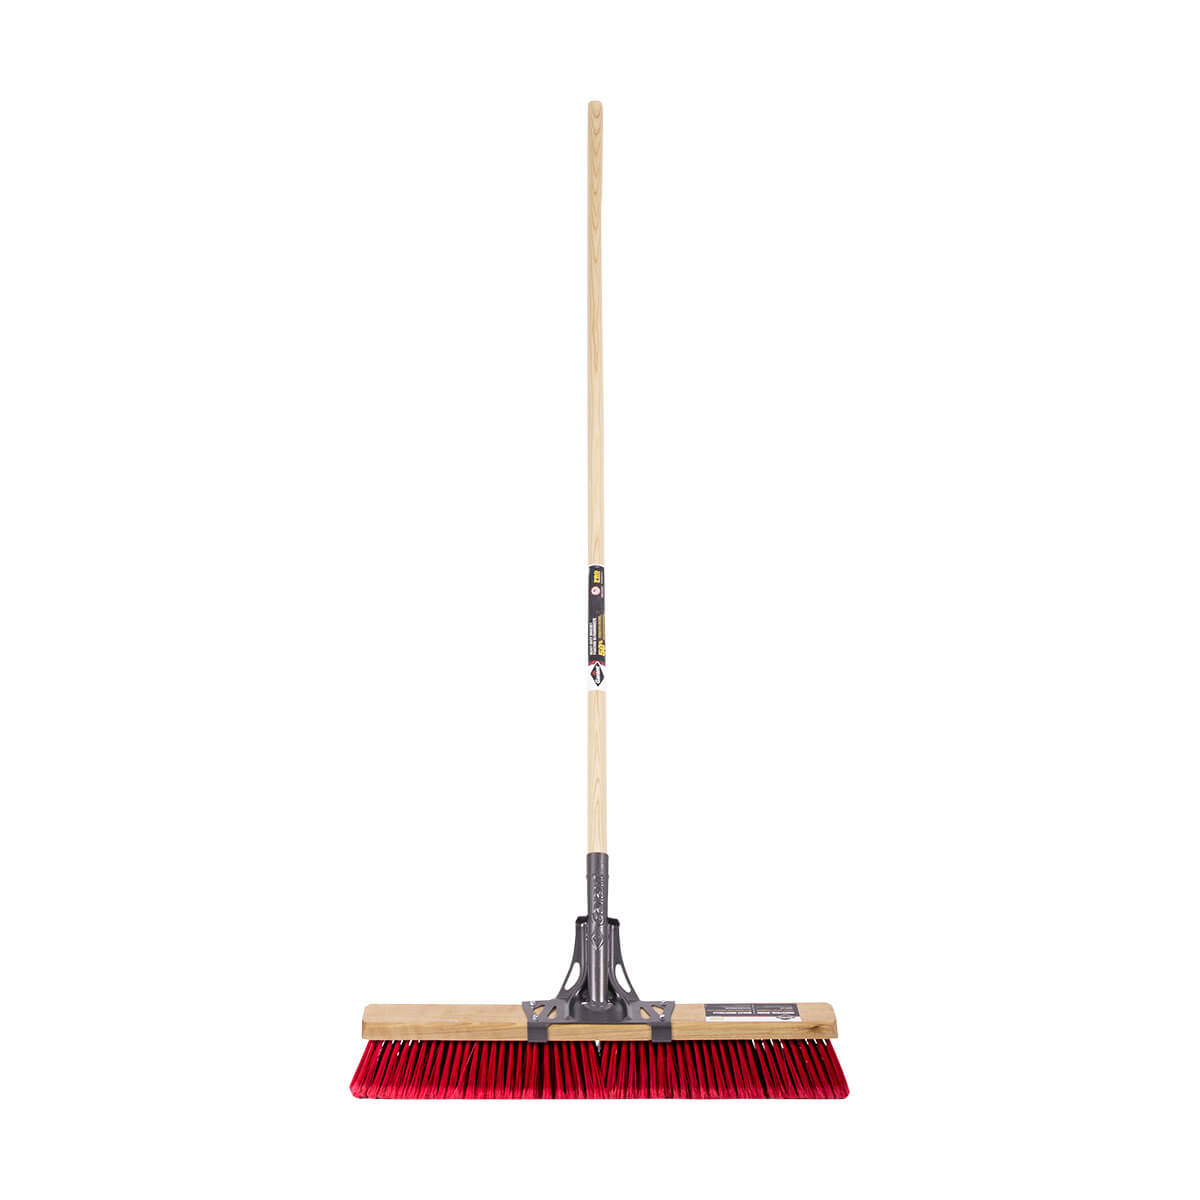 "Garant Broom Smooth Surface 24"" PRO"